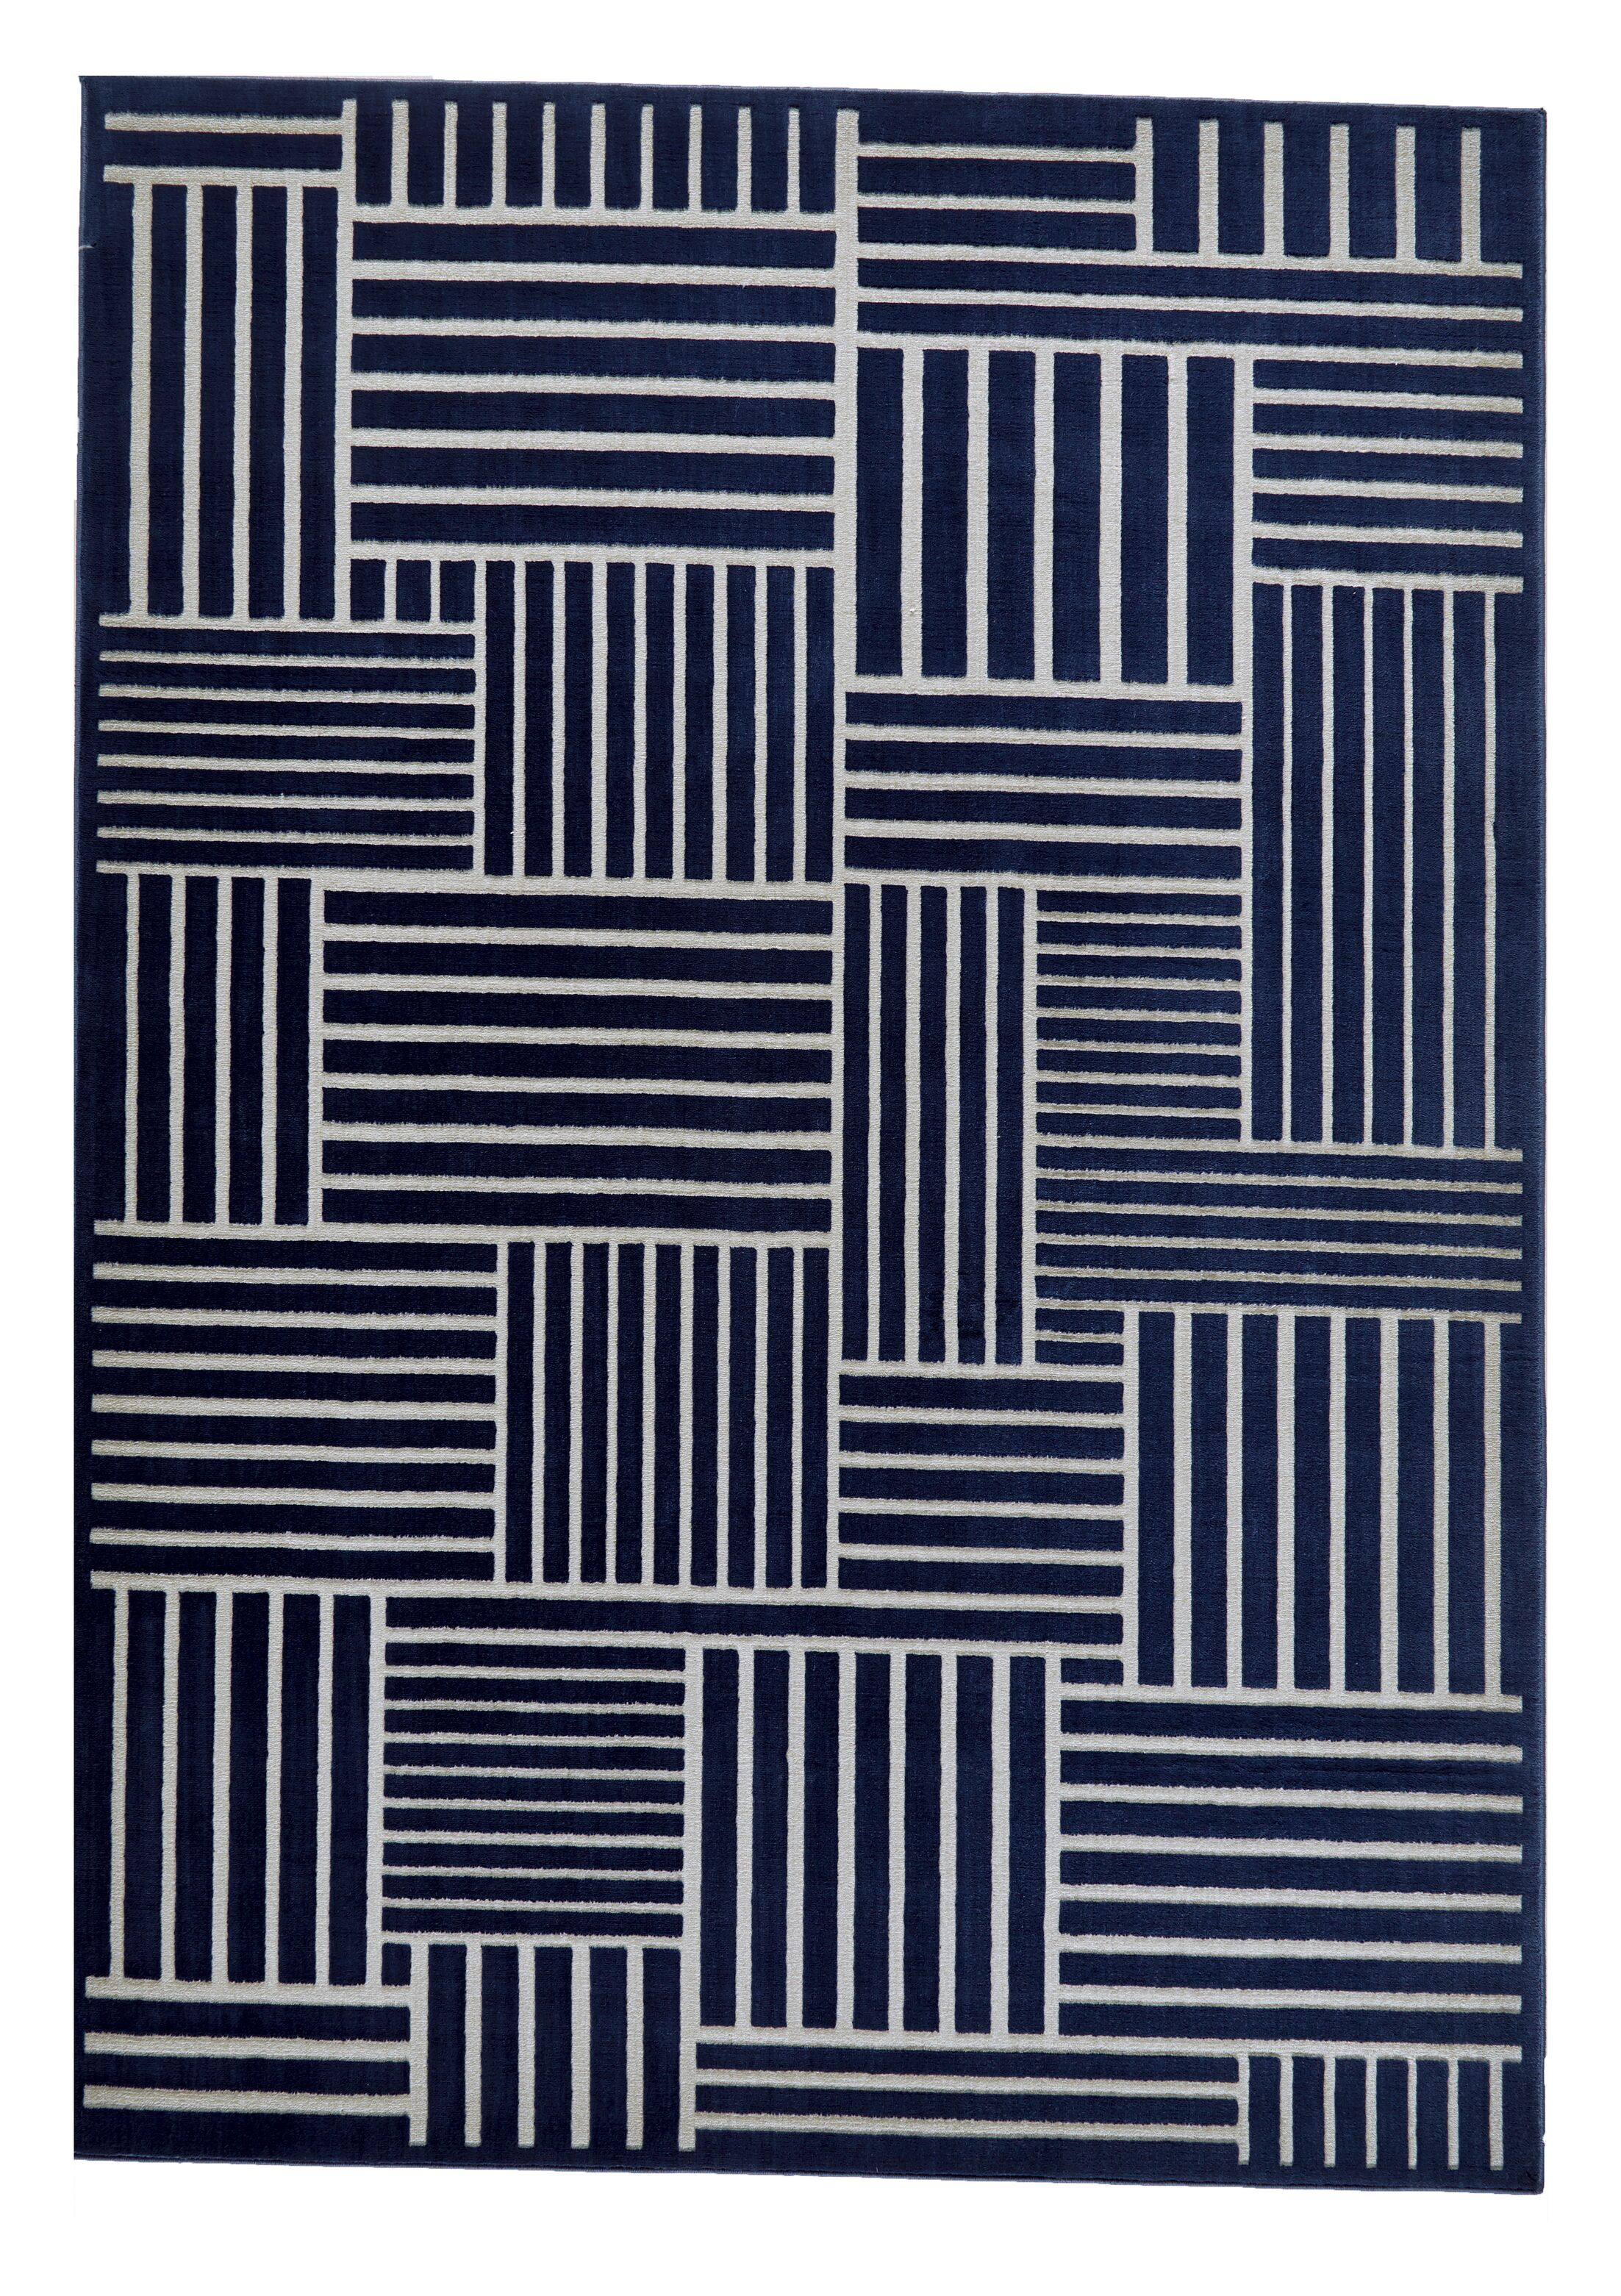 Grossman Navy/Gray Area Rug Rug Size: Rectangle 6'7